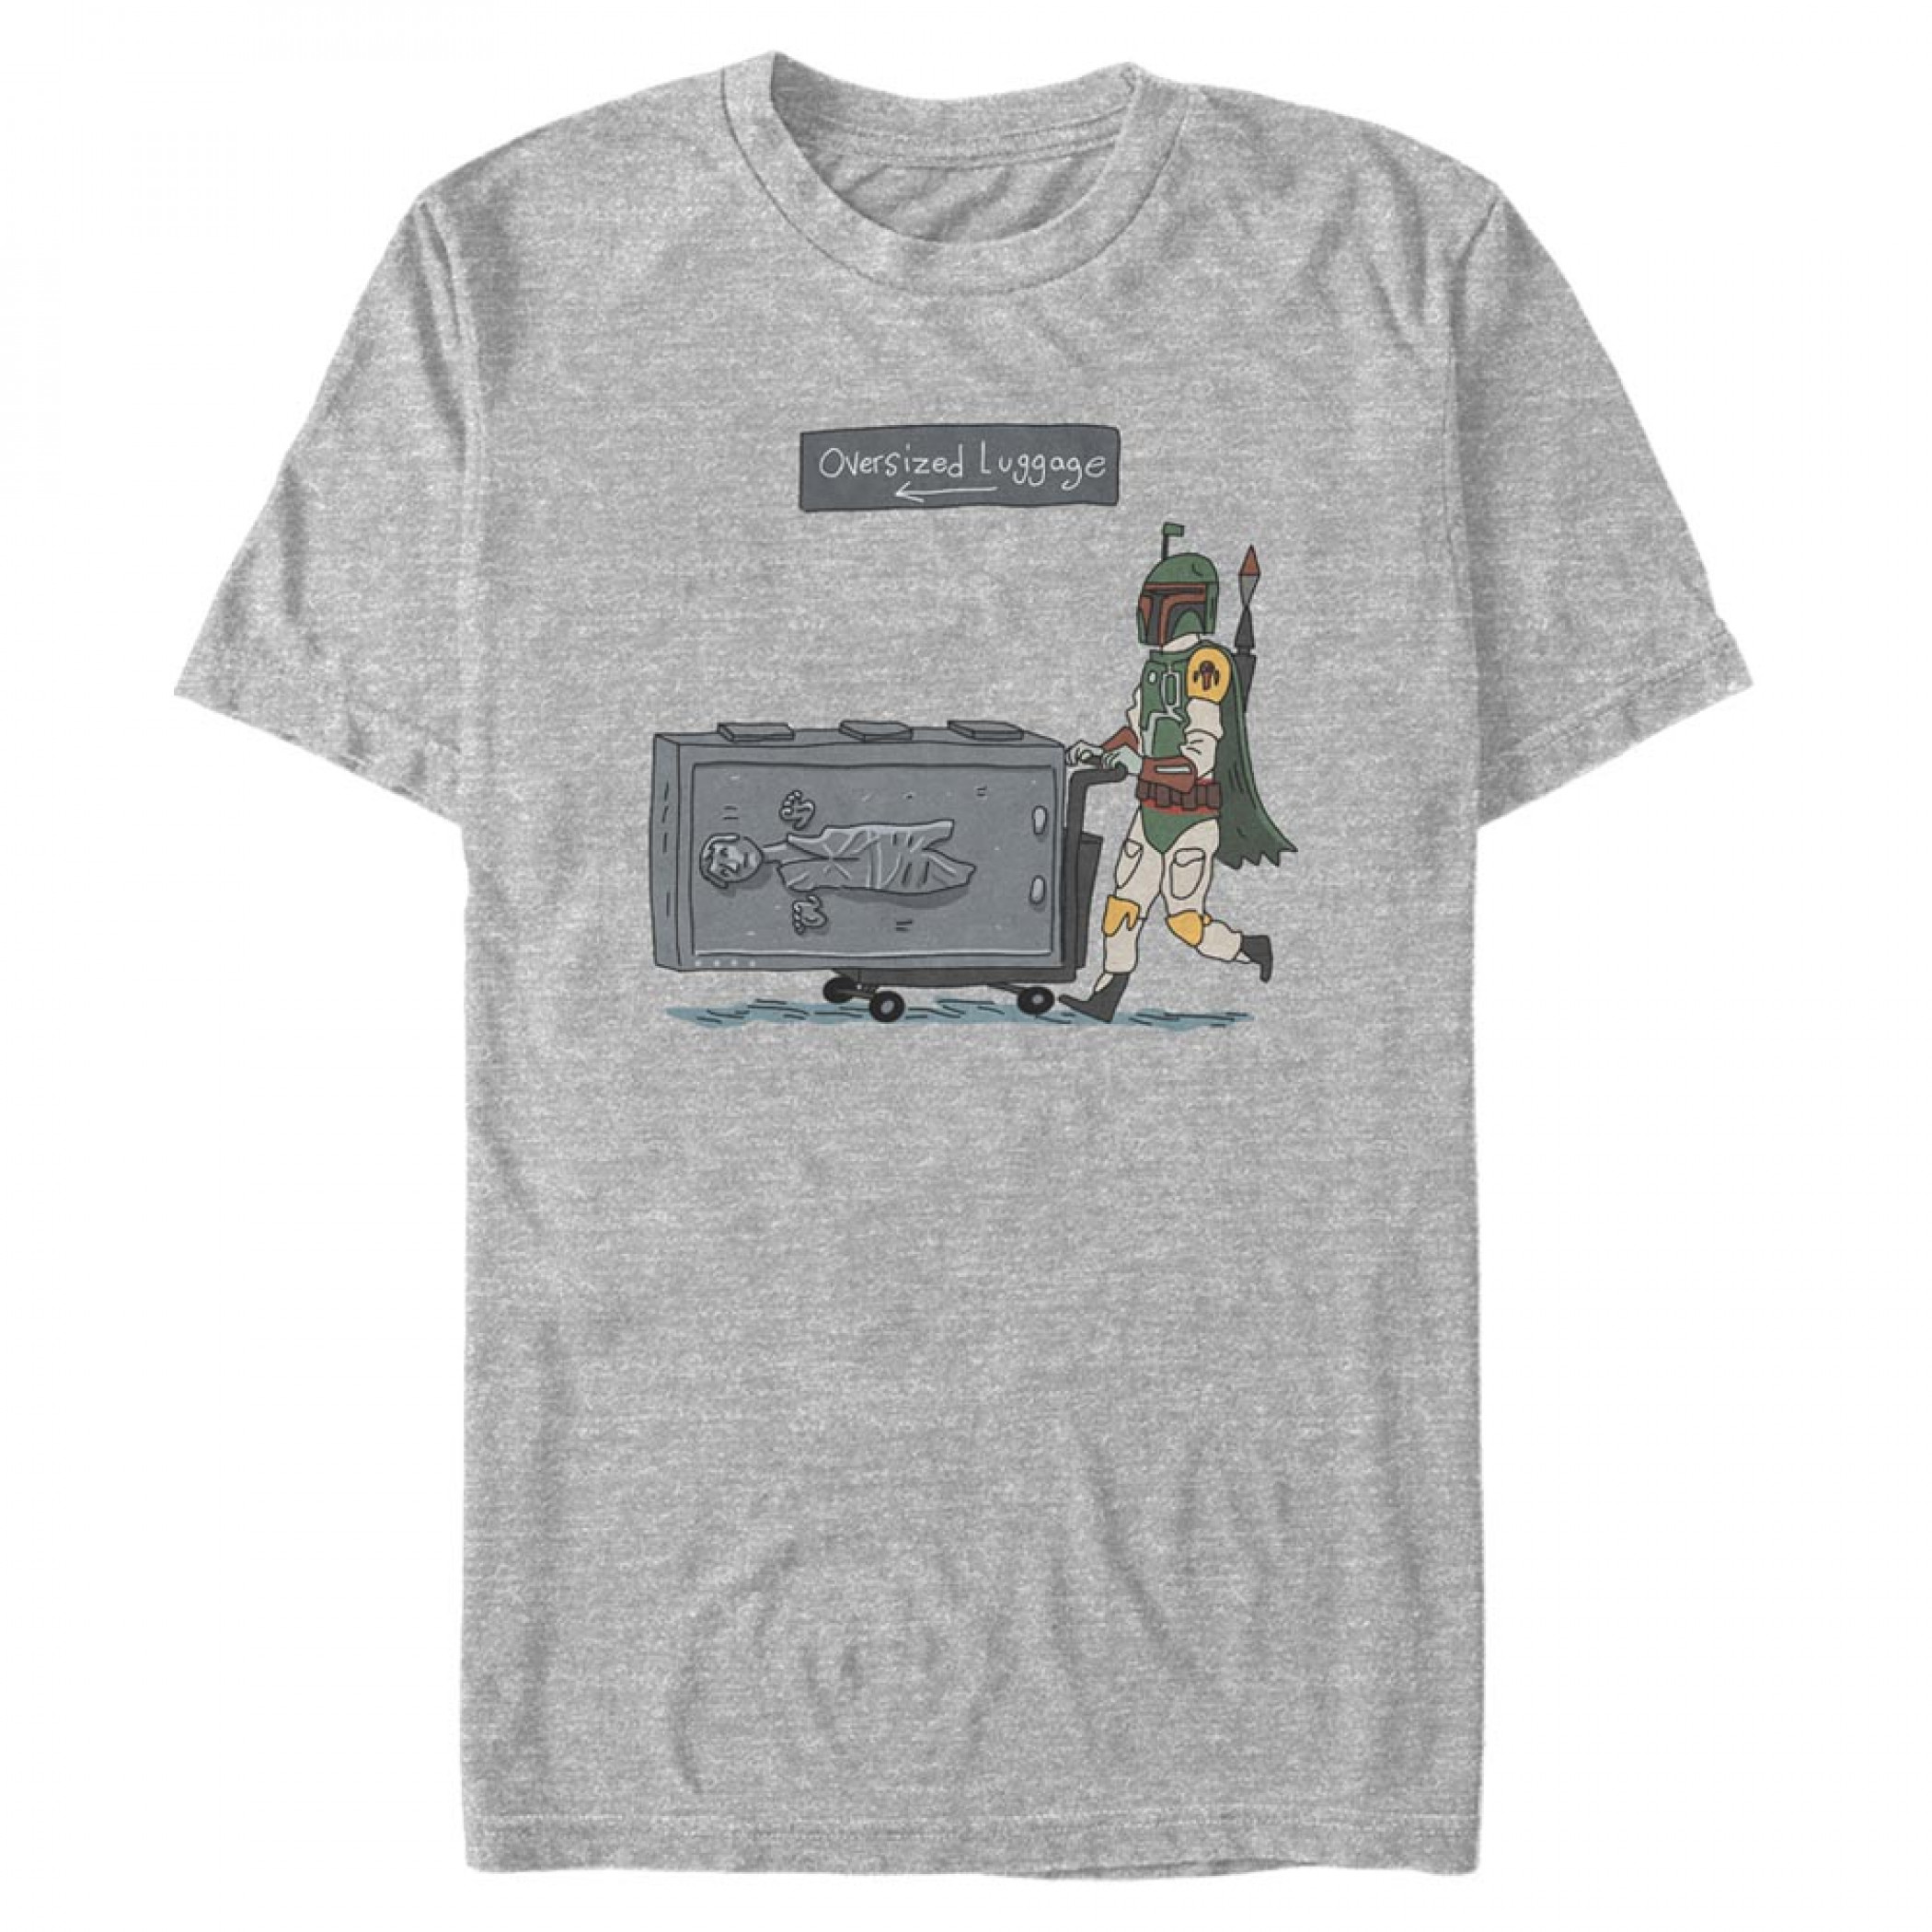 Star Wars Boba Fett Oversized Luggage T-Shirt